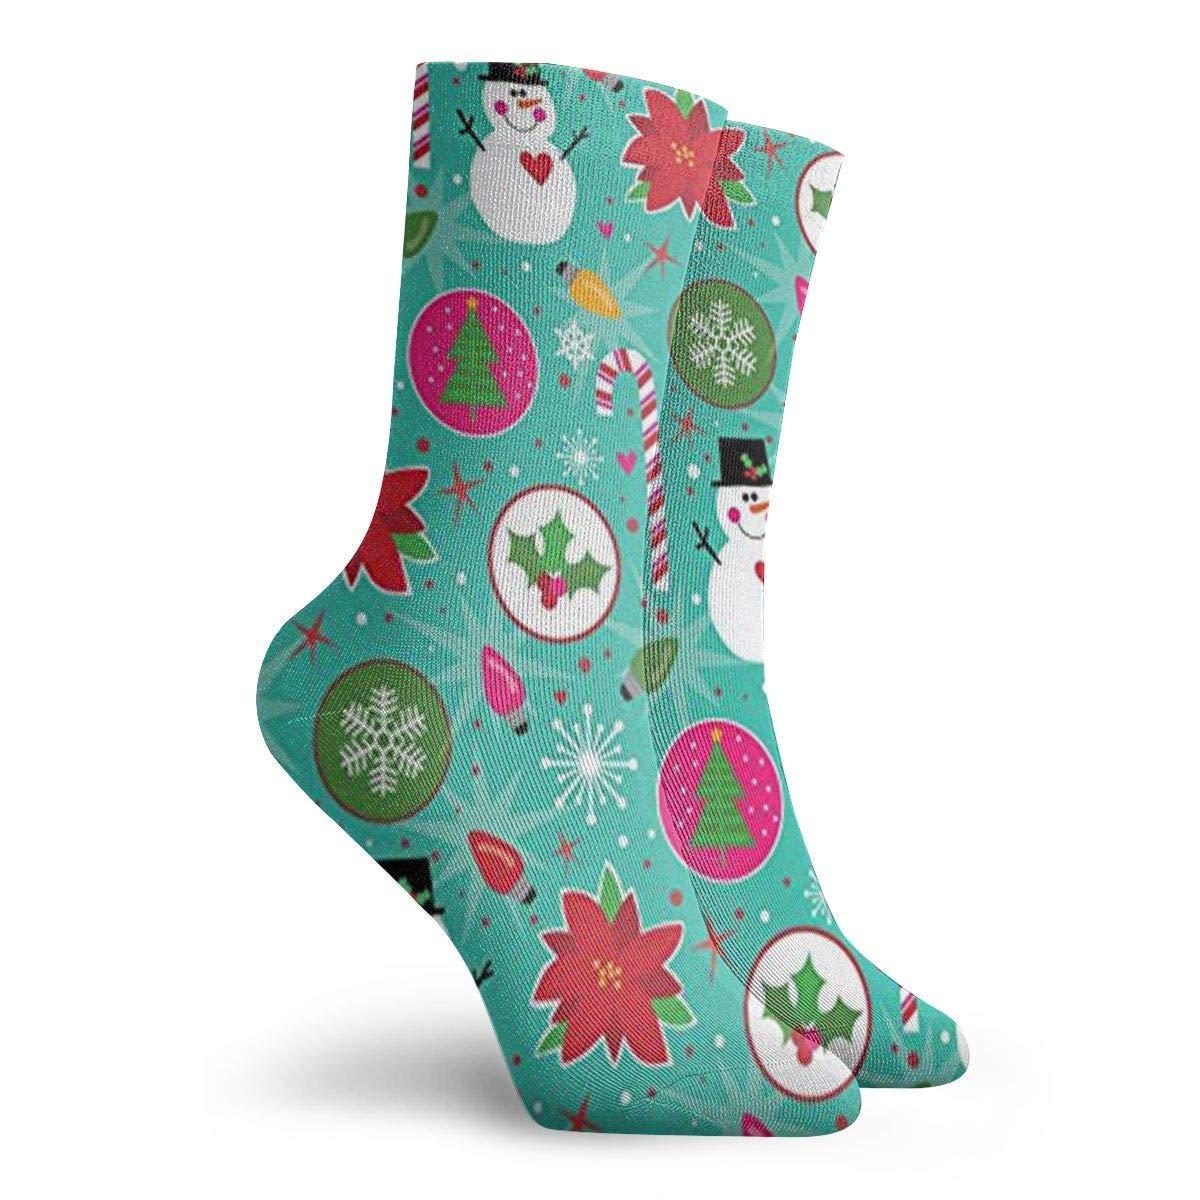 Christmas Snowman Unisex Funny Casual Crew Socks Athletic Socks For Boys Girls Kids Teenagers